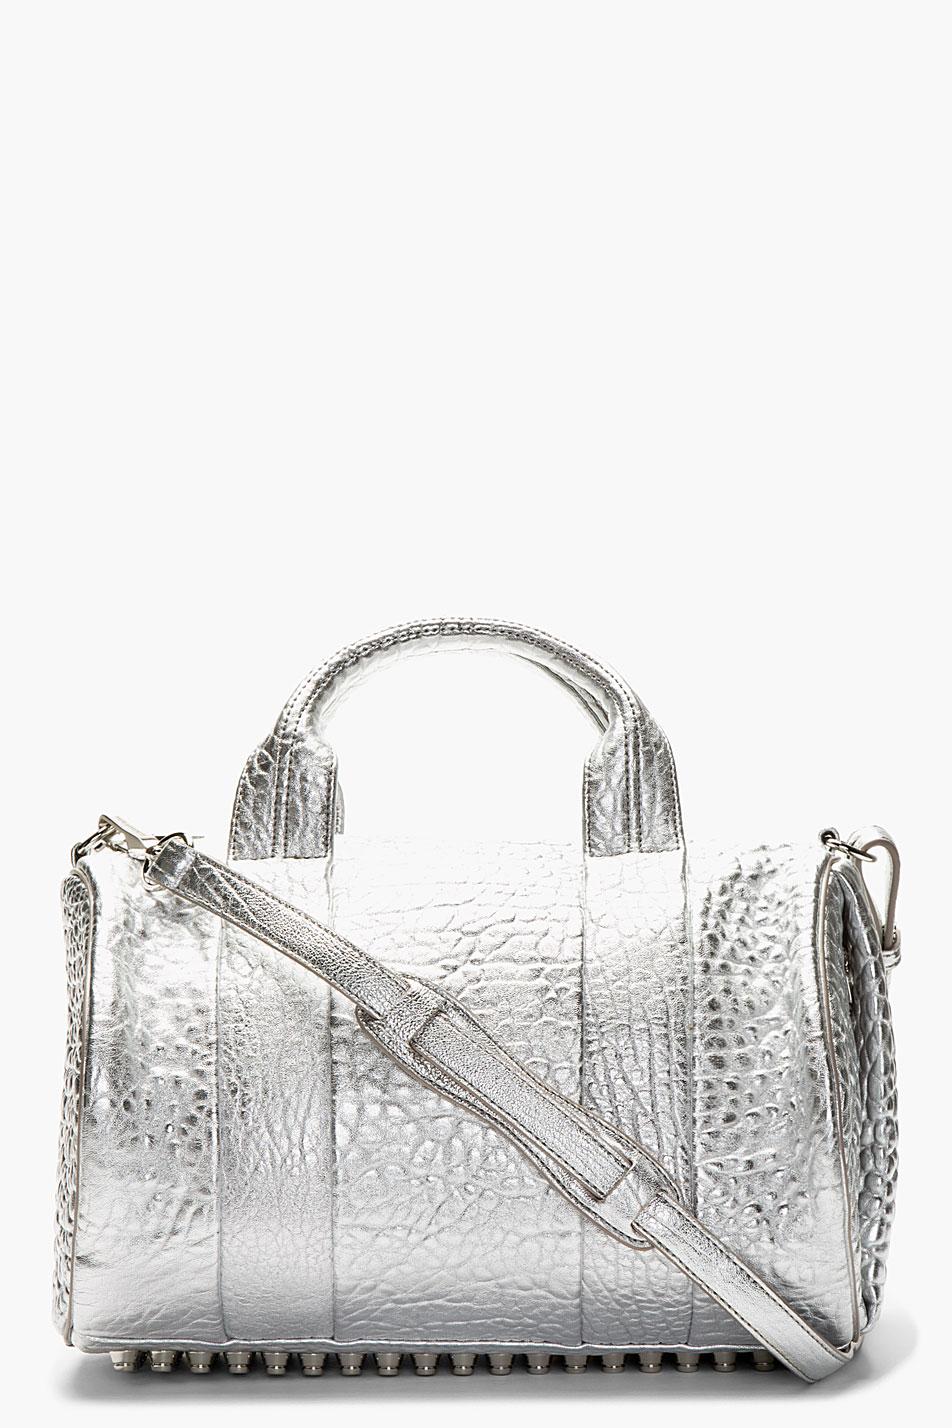 Alexander wang silver rocco handbag